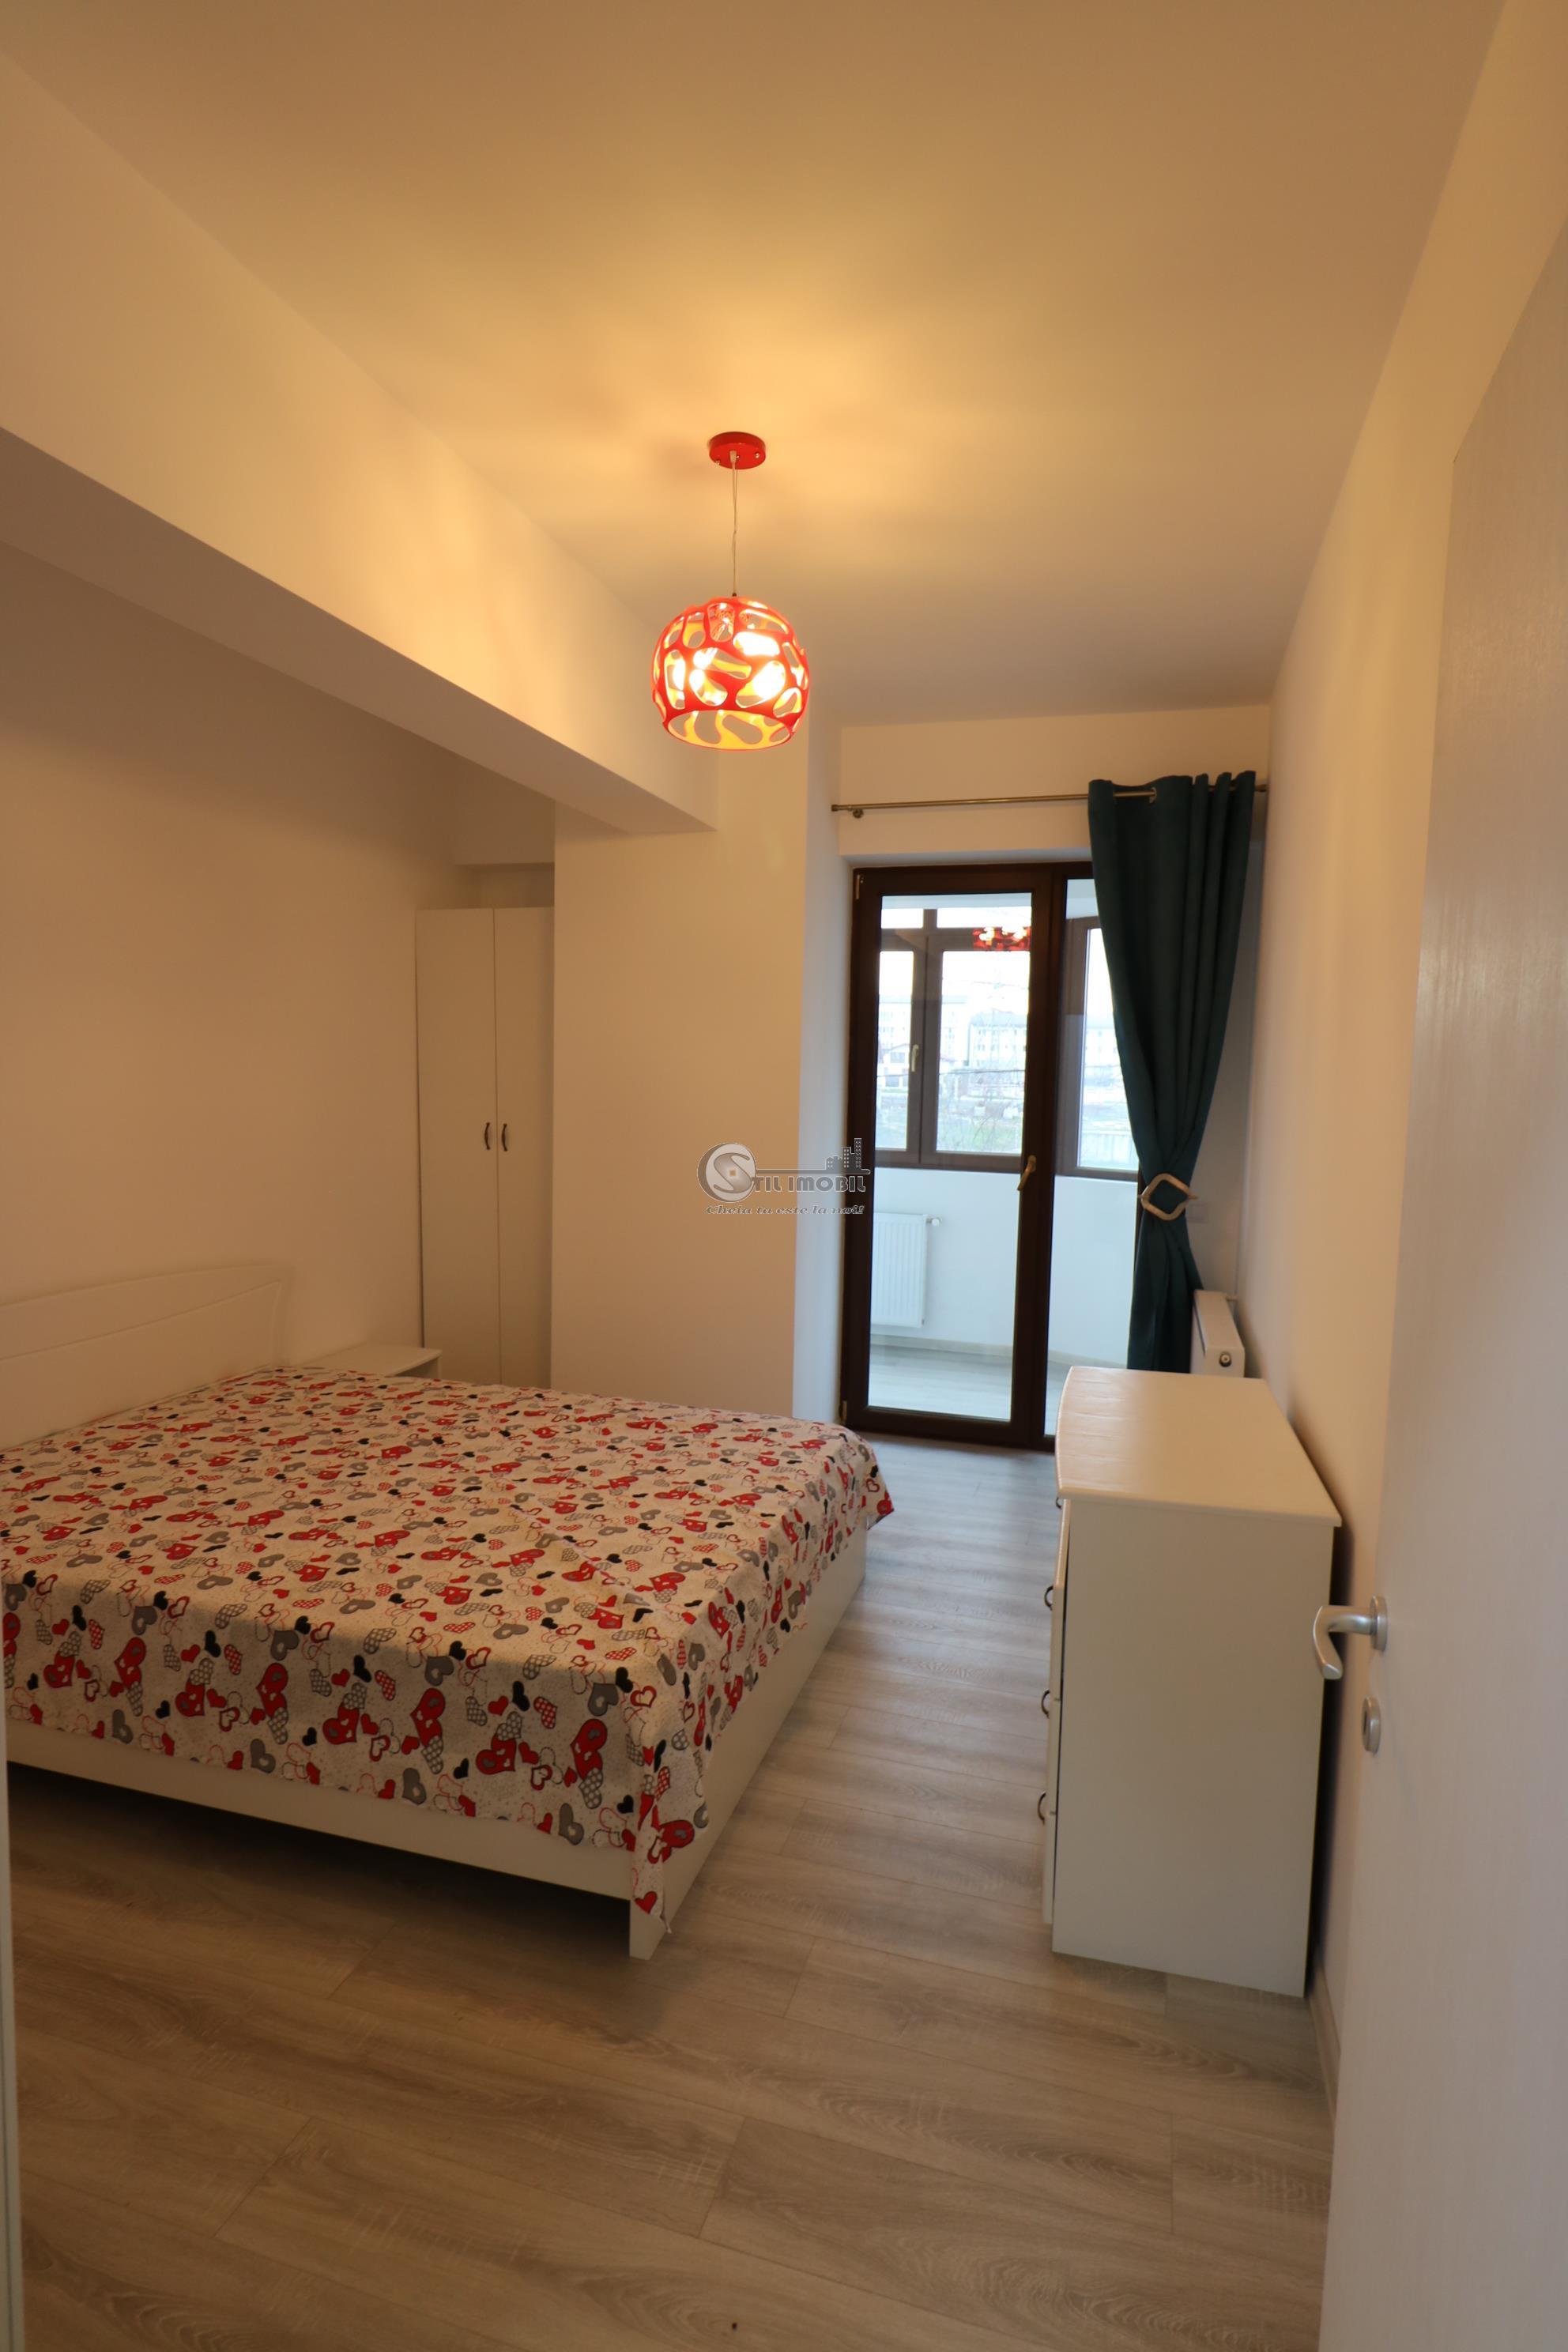 Apartament nou cu 2 camere,62,3mp,Selgros, 82000 euro